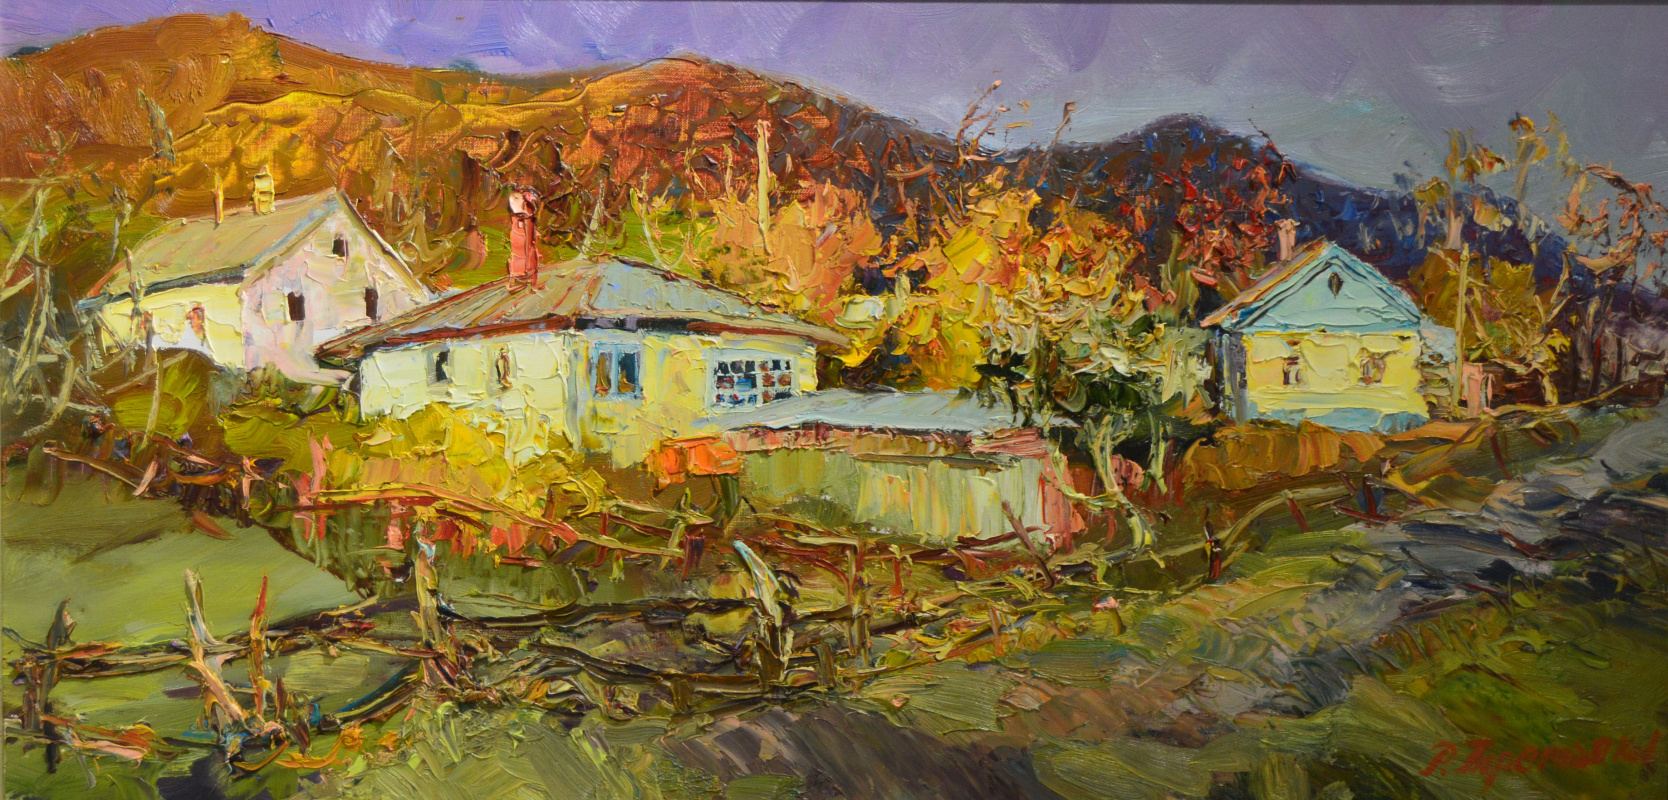 Roman Tretyakov. The colors of autumn